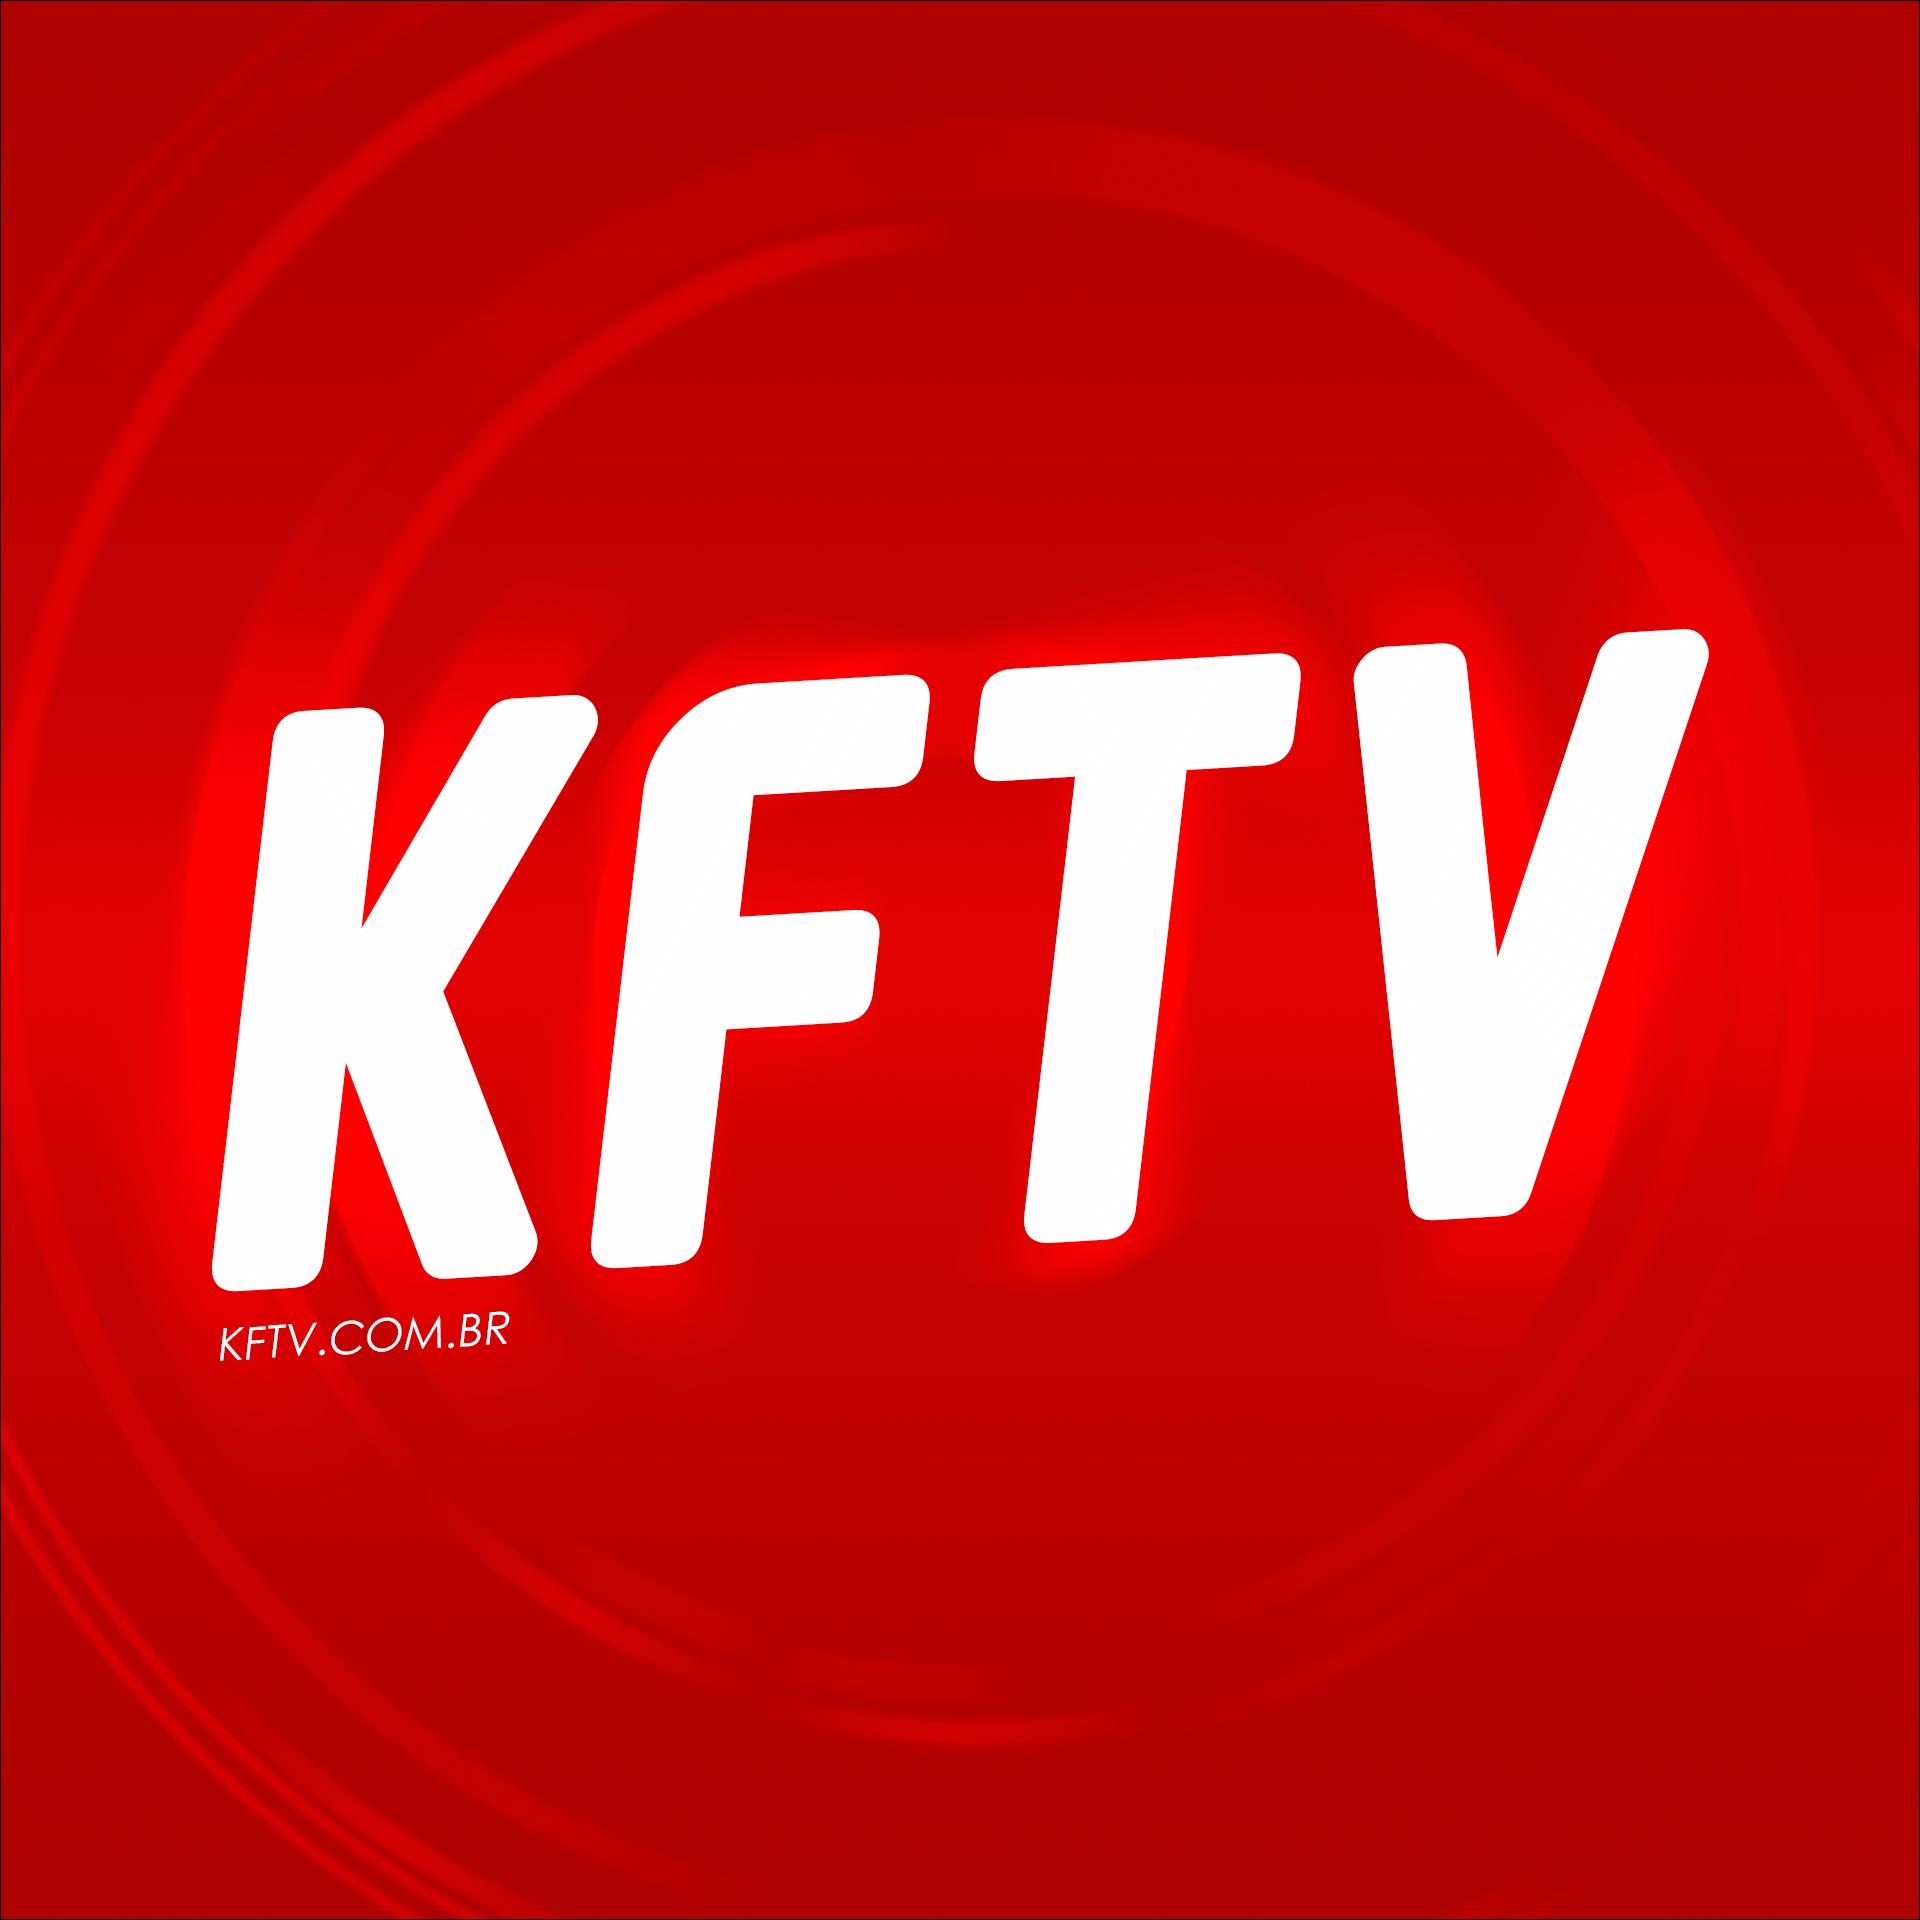 KFTV-logo-end-podcast4-1